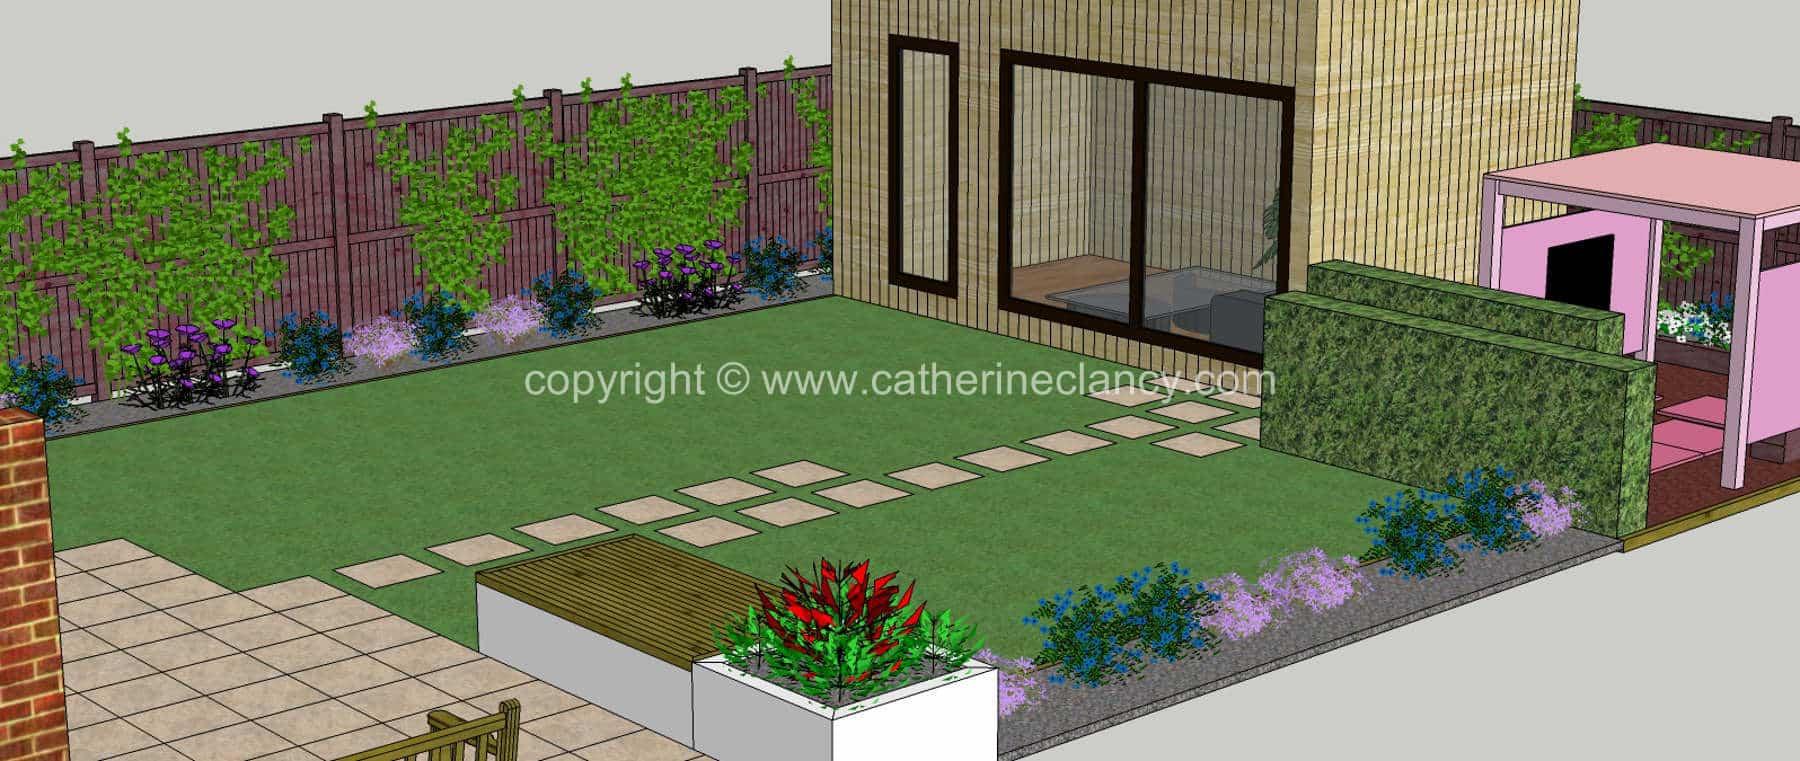 ecostudio-garden-london-5